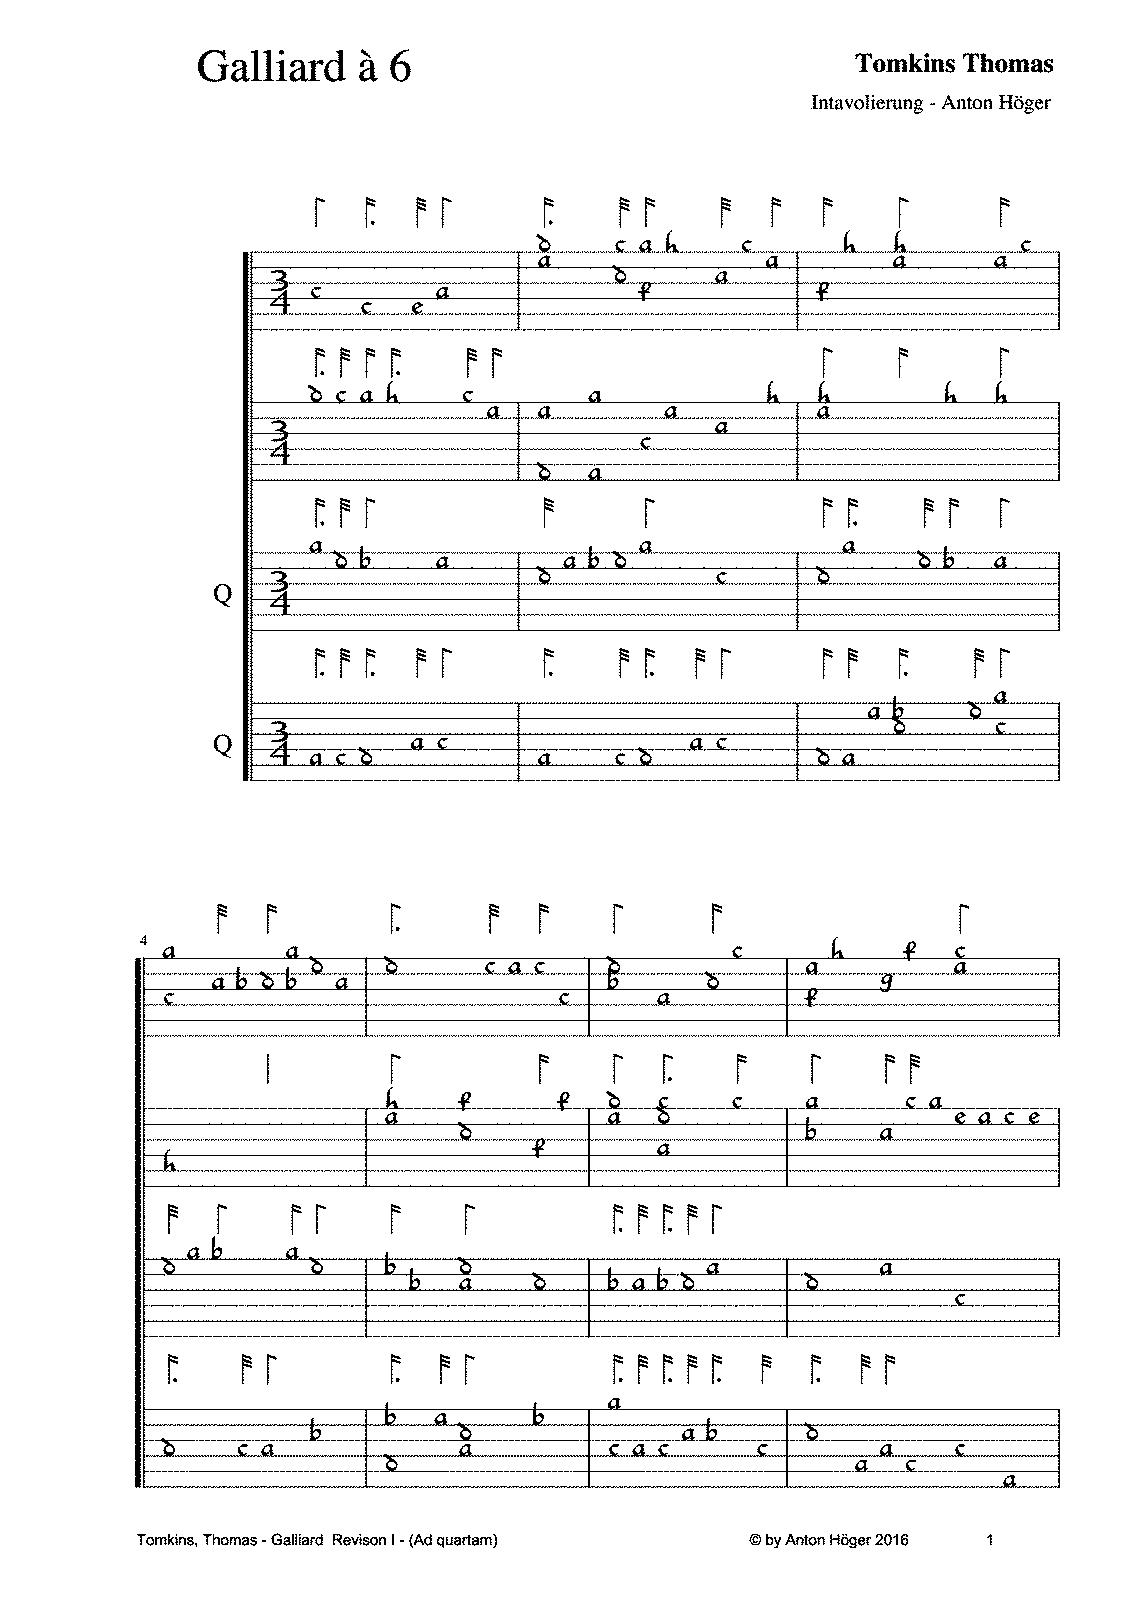 Galliard à 6 (Tomkins, Thomas) - IMSLP/Petrucci Music